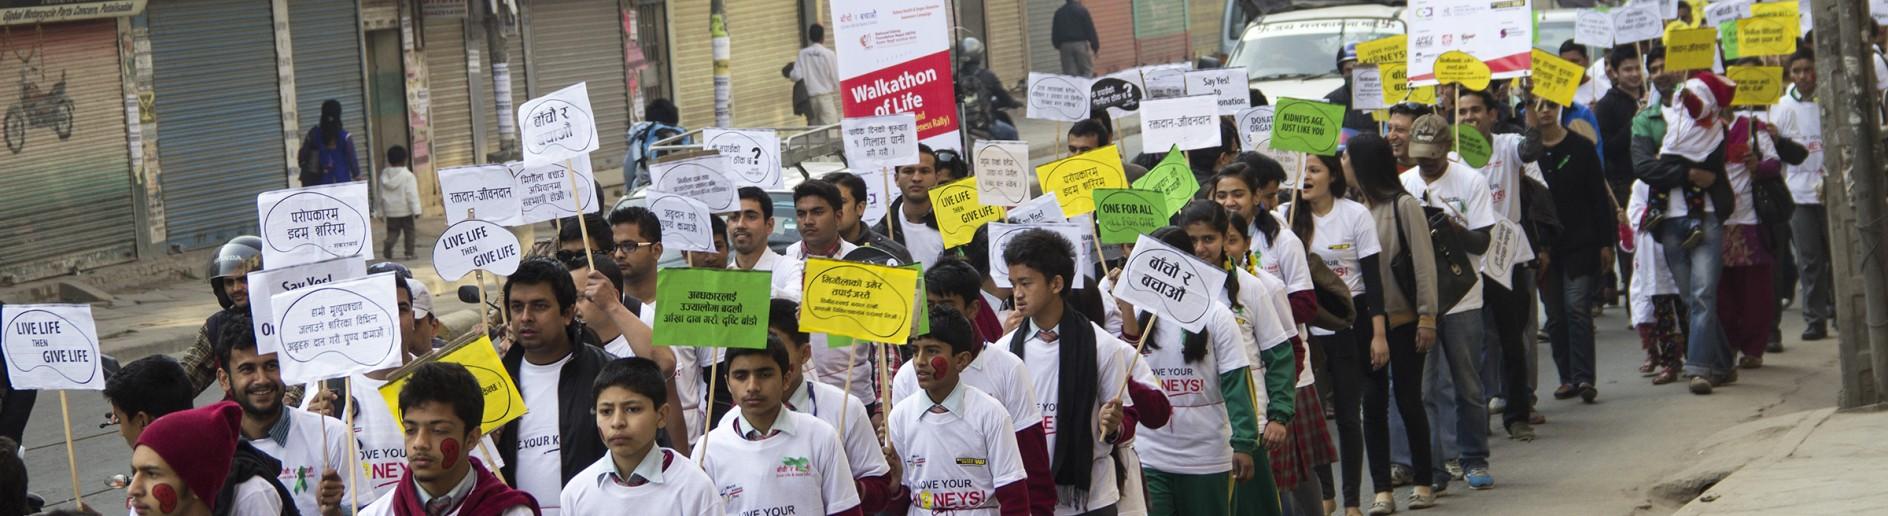 WKD Nepal 2014: Walkathlon of Life